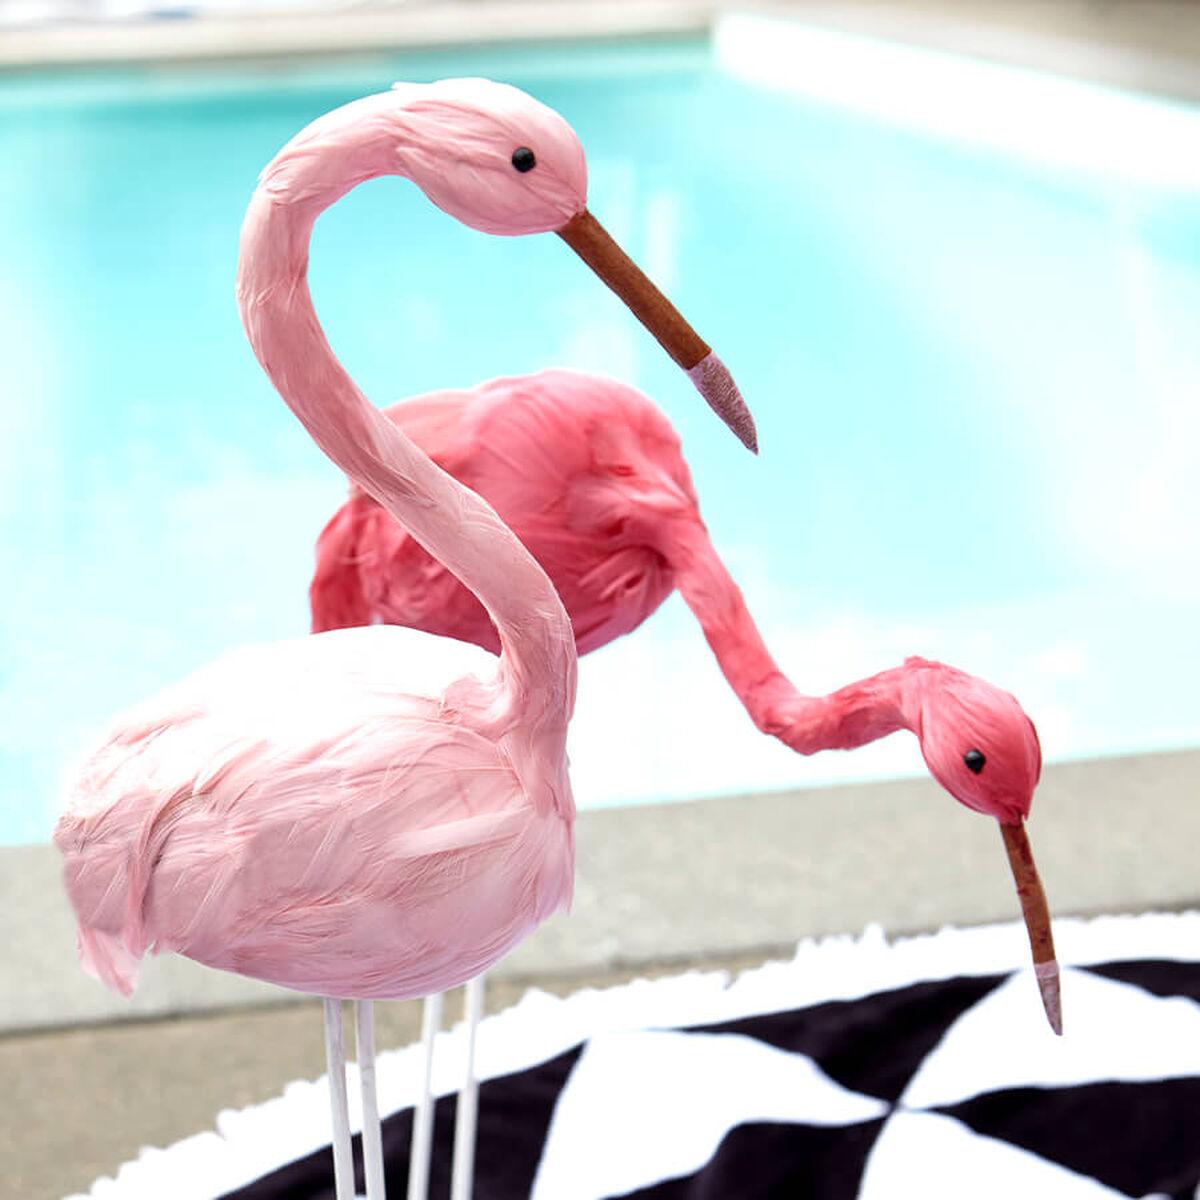 flamingo deko flamingo dekoration kaufen butlers. Black Bedroom Furniture Sets. Home Design Ideas